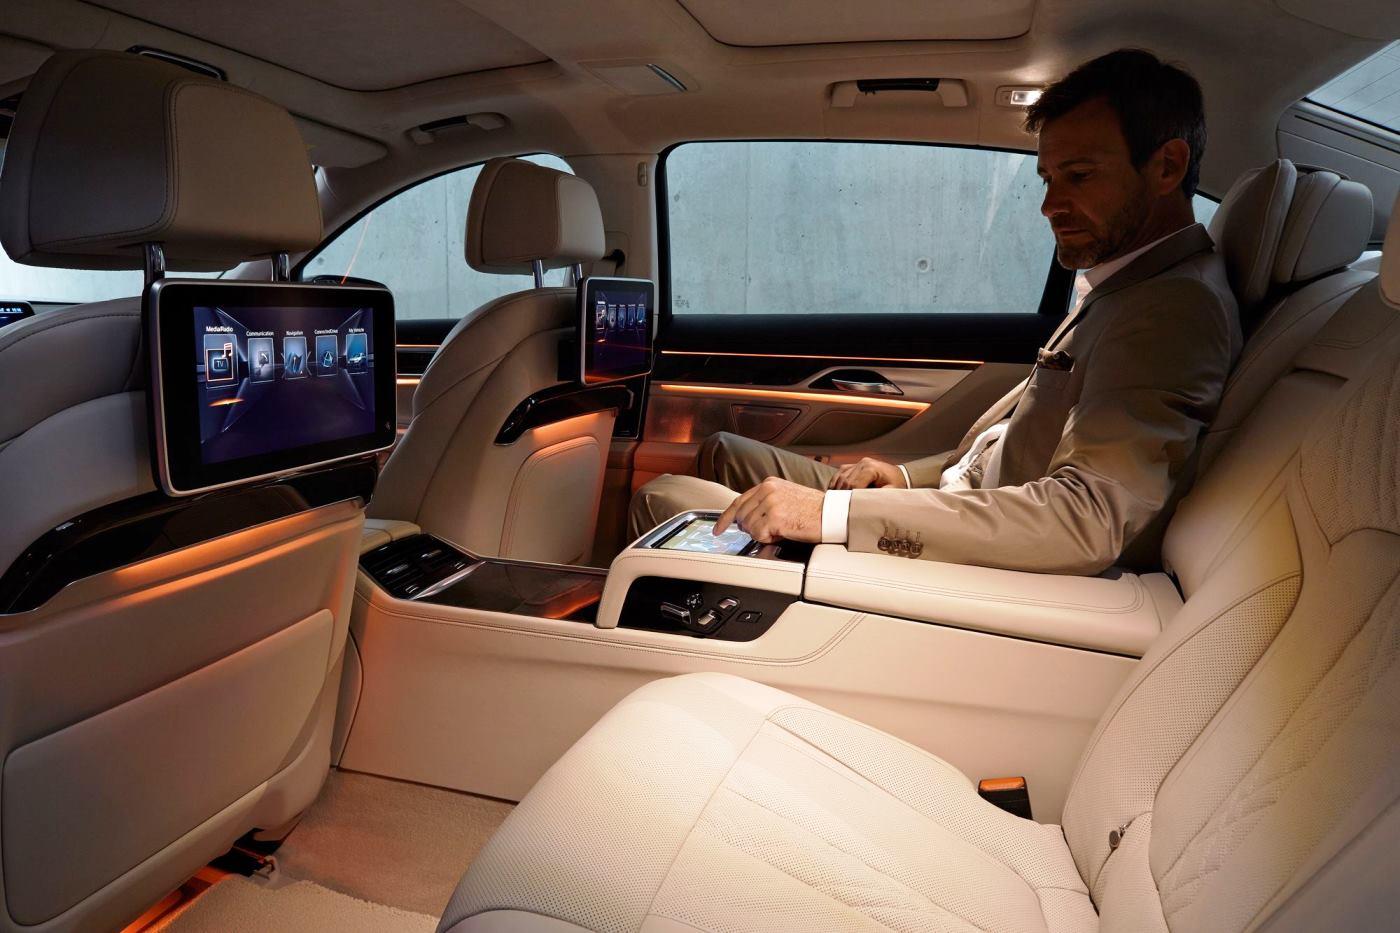 2016 BMW 7 Series Interior Photos 7